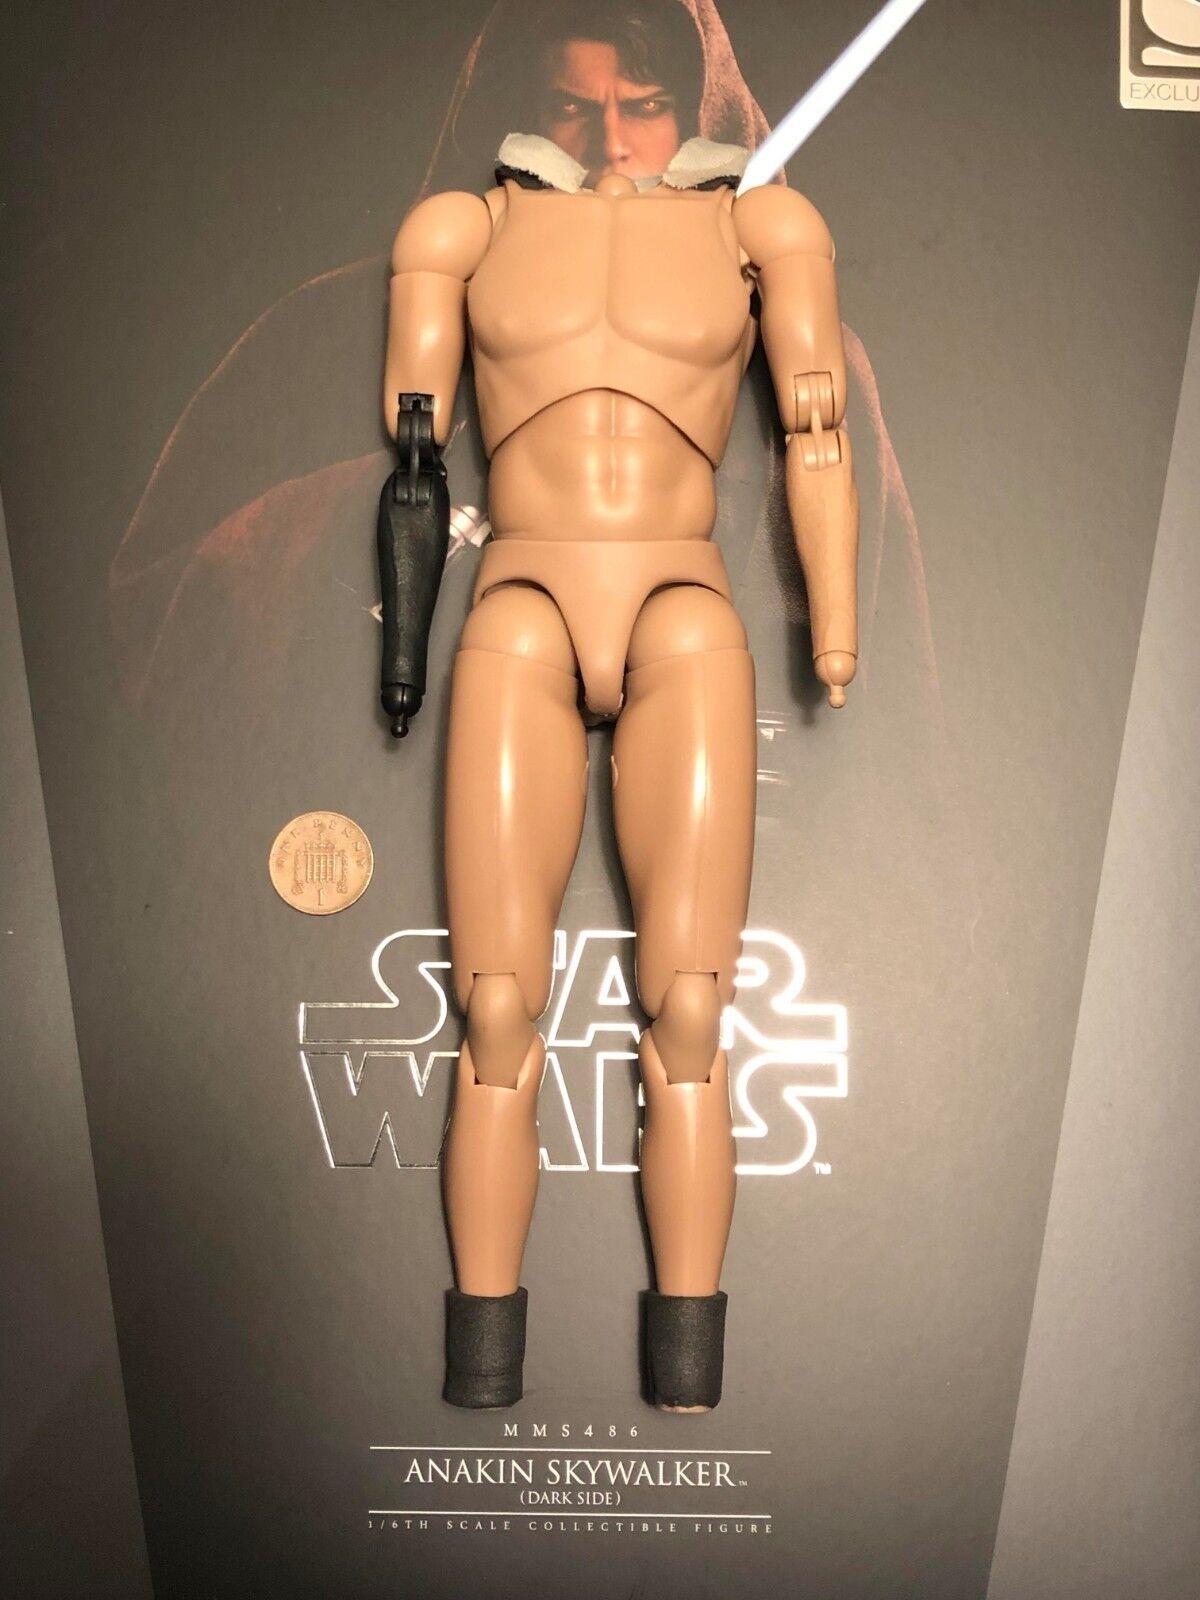 Hot Toys Star Wars Anakin Skywalker Dark Side Nude Body loose 1 6th scale